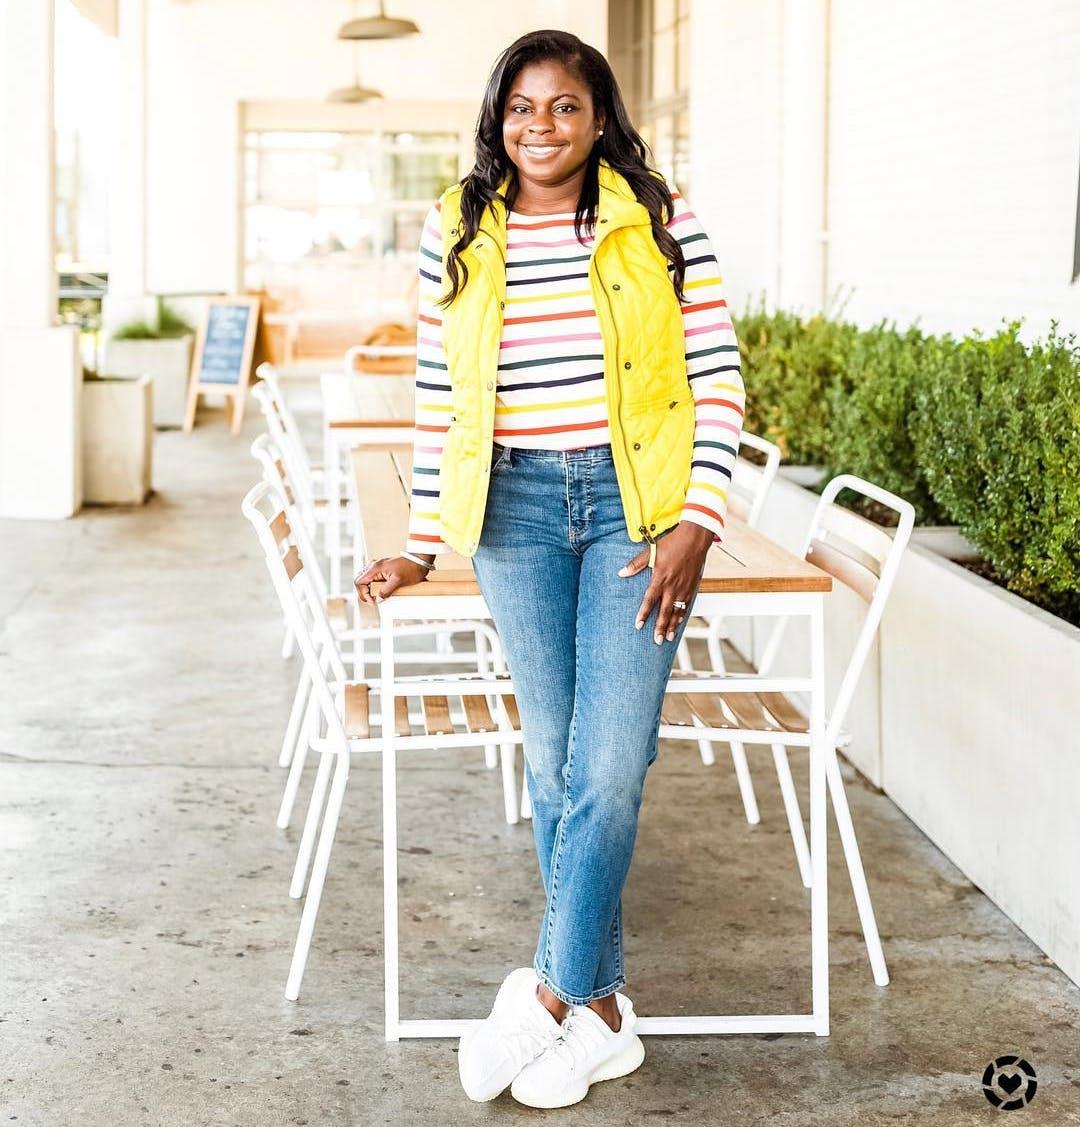 e8437b71db7 jasmine crockett wearing a yellow vest and rainbow stripe top